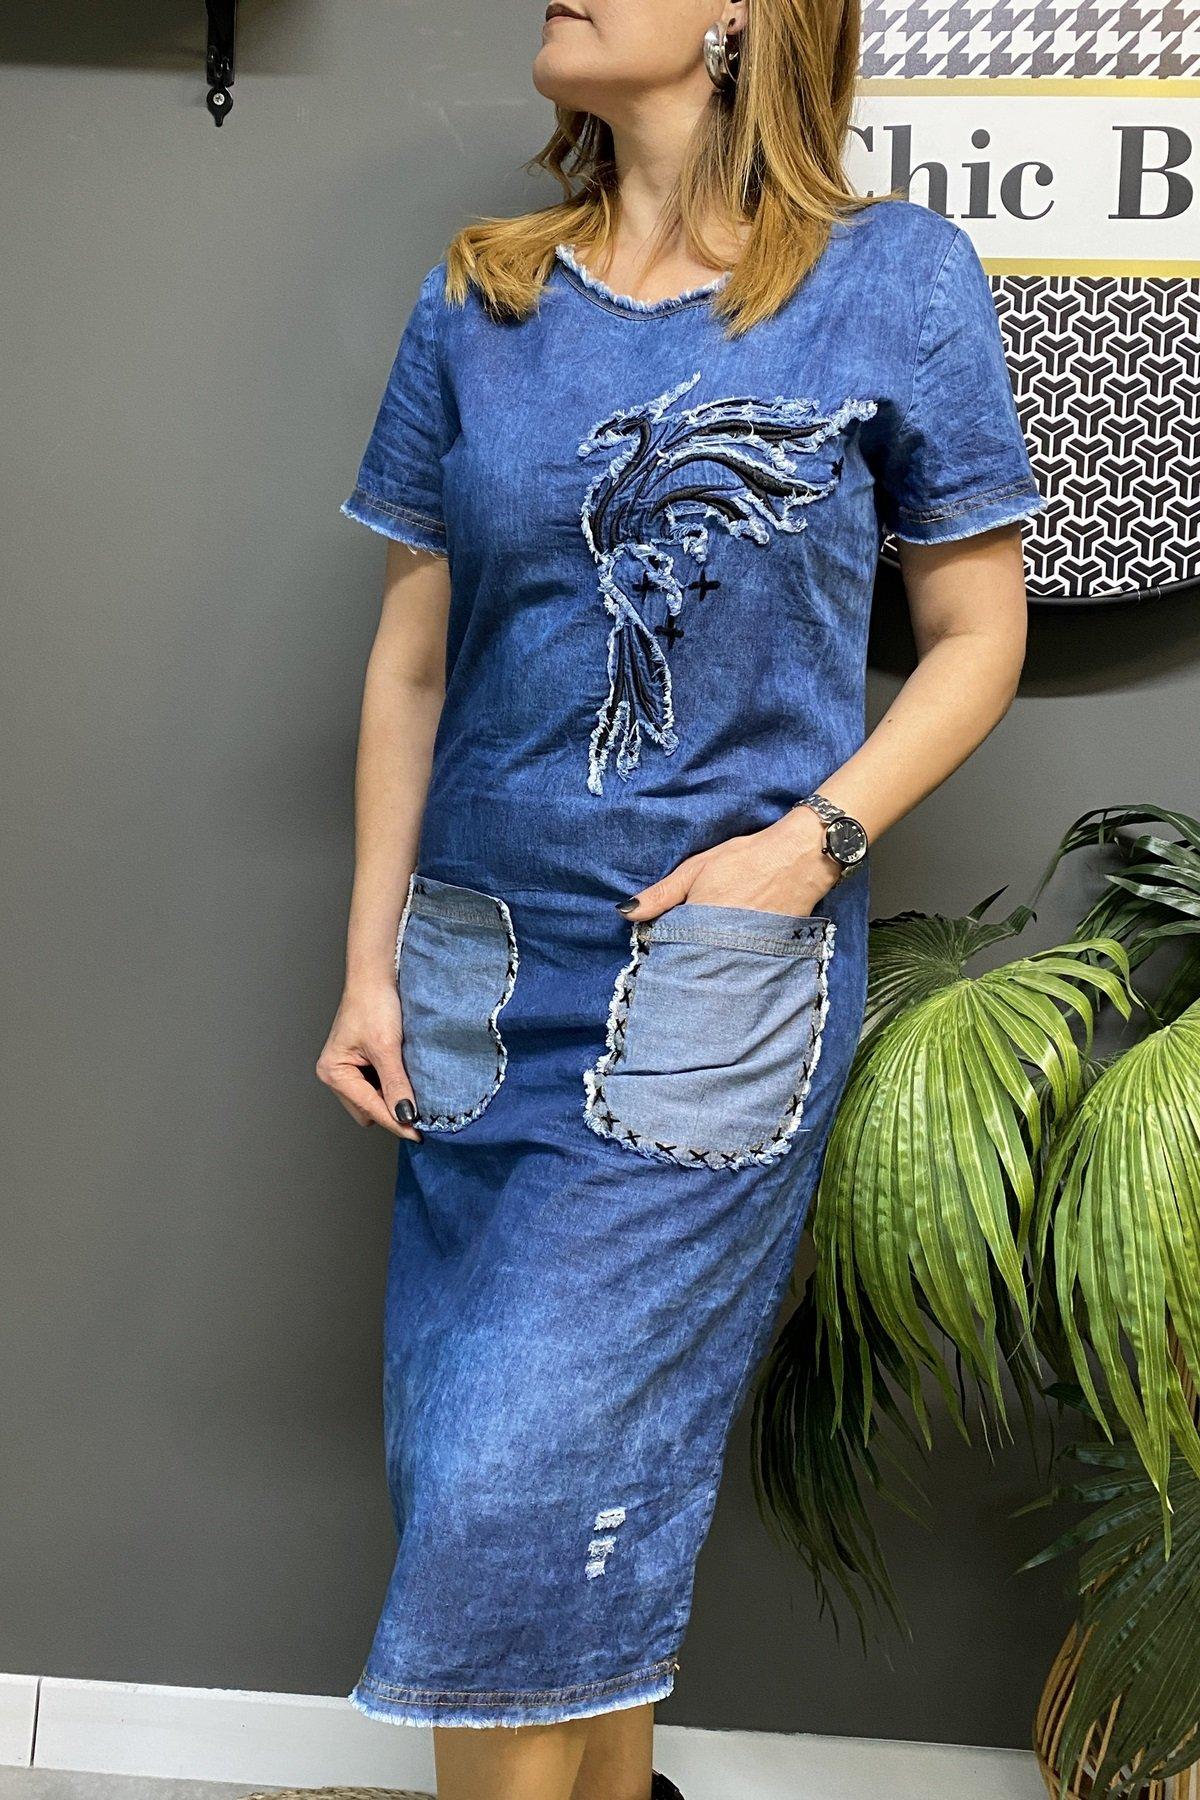 https://resim.chicbag.com.tr/p000599/mvi/onu-kus-desenli-cift-cepli-sokuk-yaka-detayli-kisa-kollu-elbise-dvs-01b03df7188a.